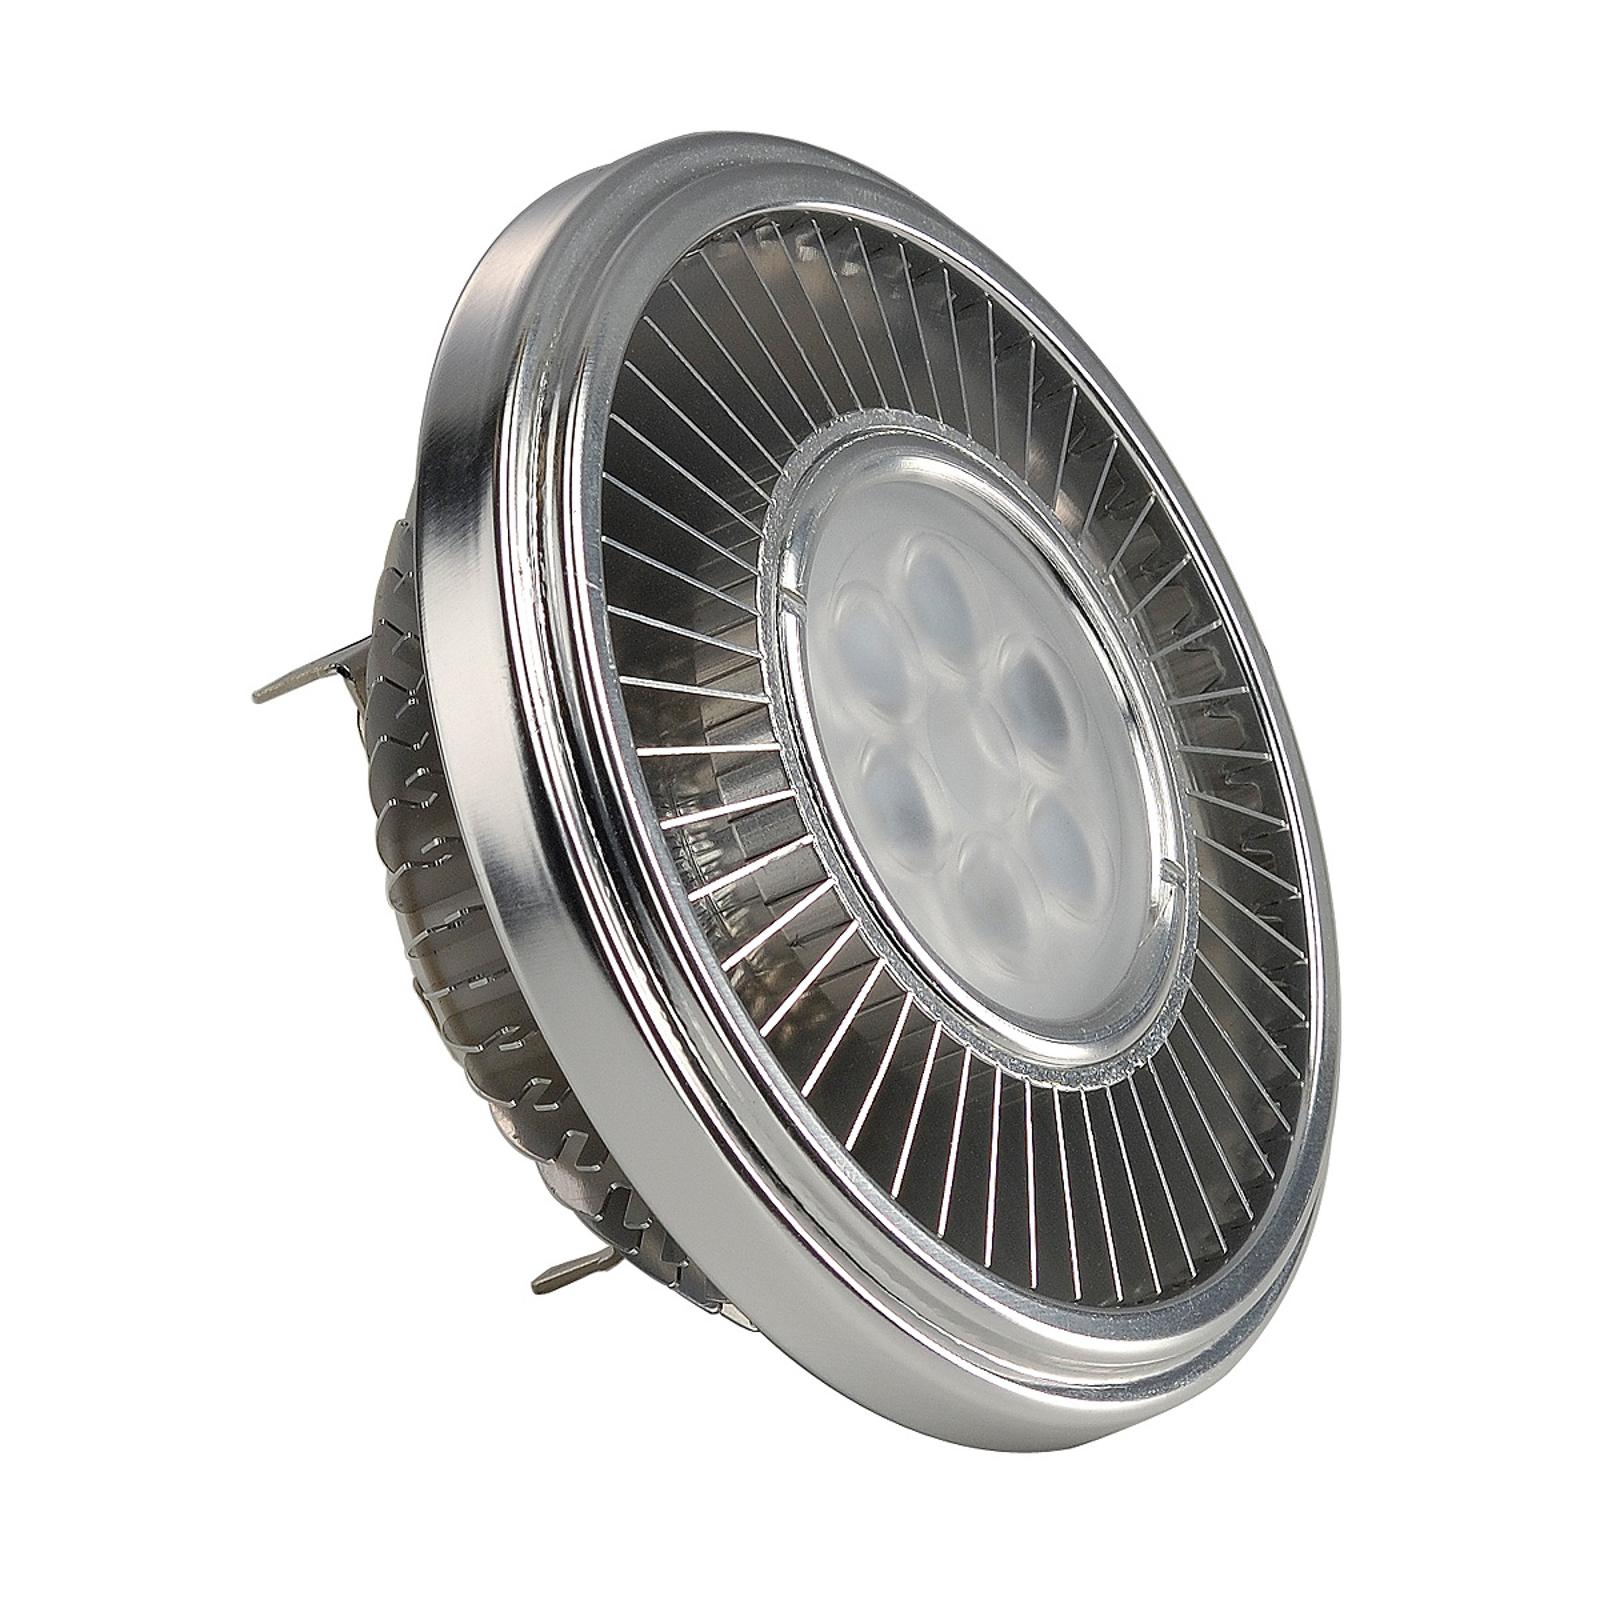 G53 15W AR111 POWERLED Reflektorlampe warmweiß 30°